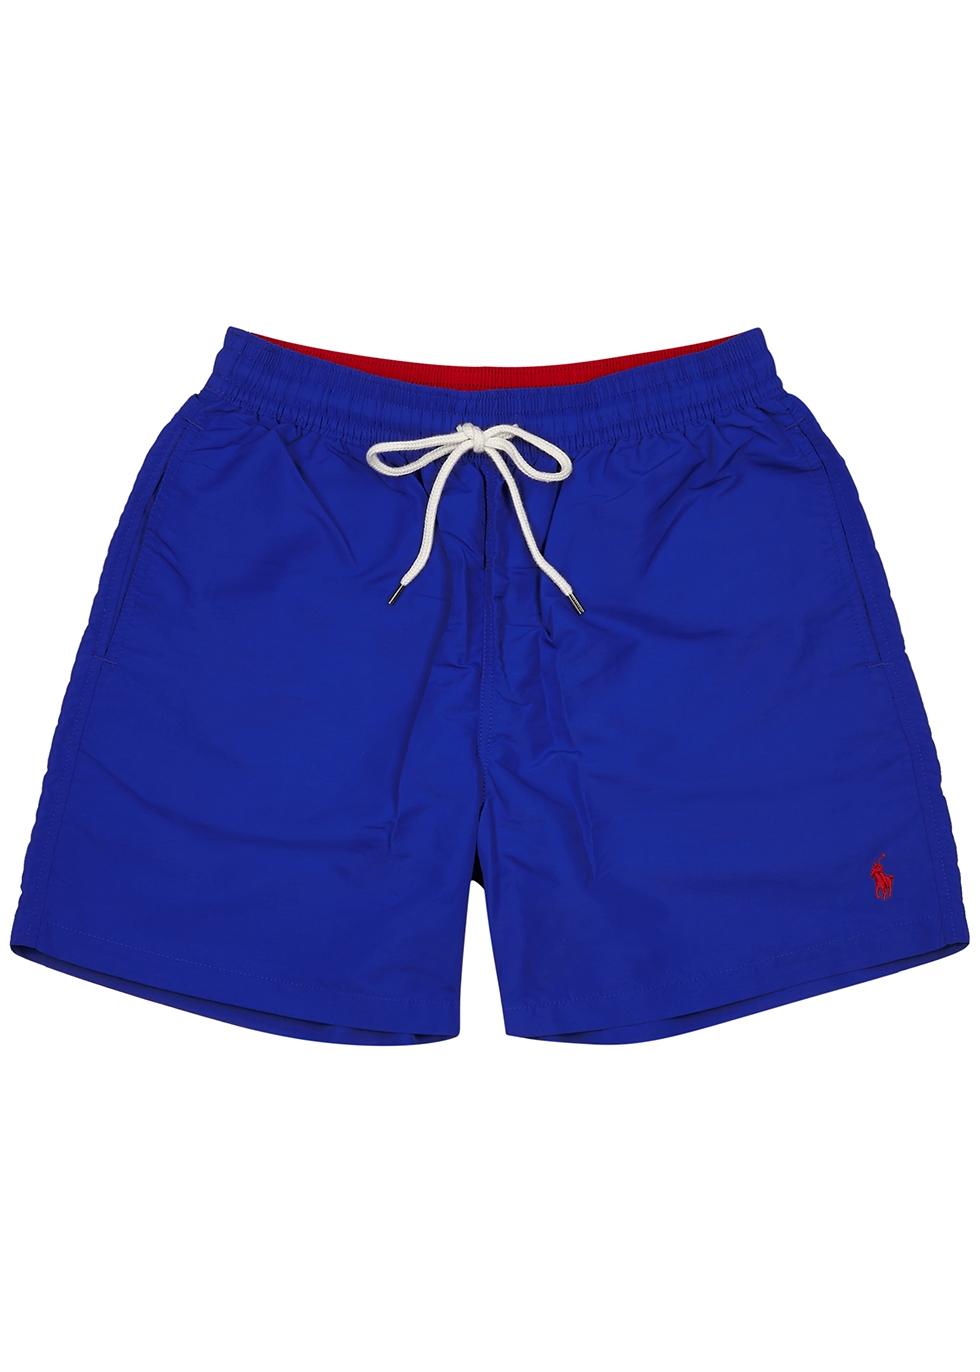 Hawaiian royal blue swim shorts